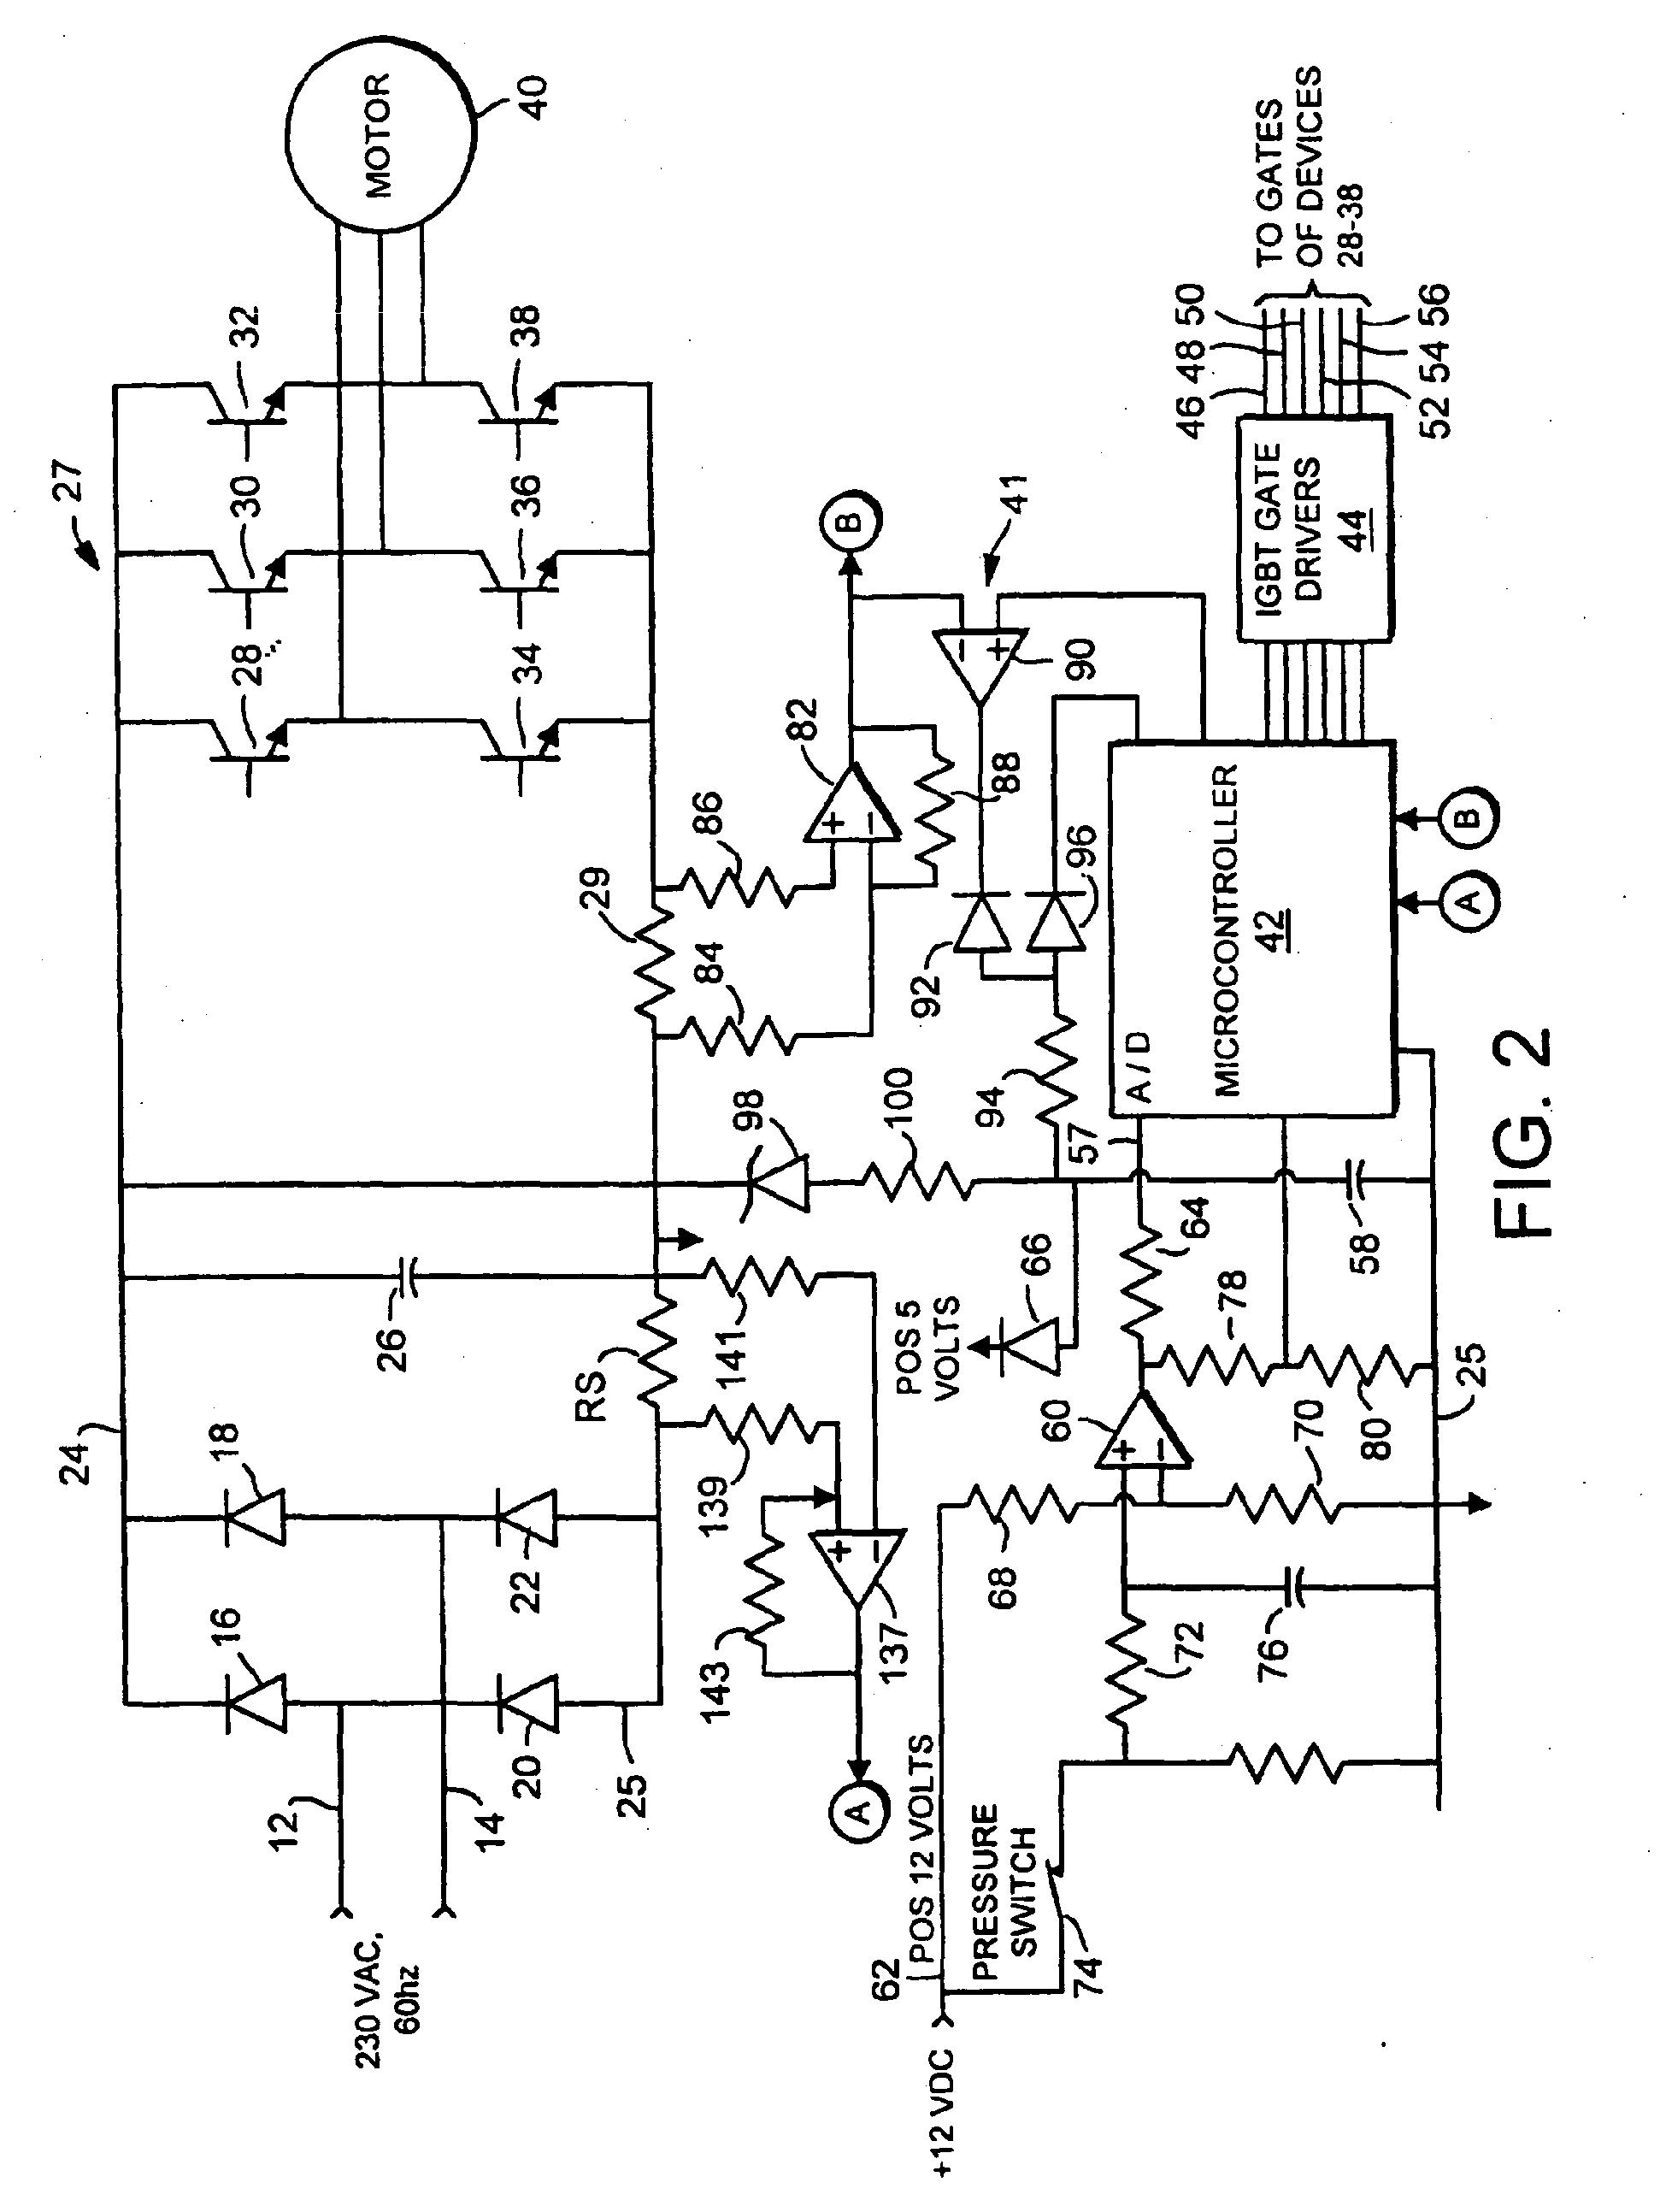 fema trailer wiring diagram box wiring diagram 4 Prong Trailer Wiring Diagram zero speed switch schaltplang auto electrical wiring diagram 4 prong trailer wiring diagram fema trailer wiring diagram